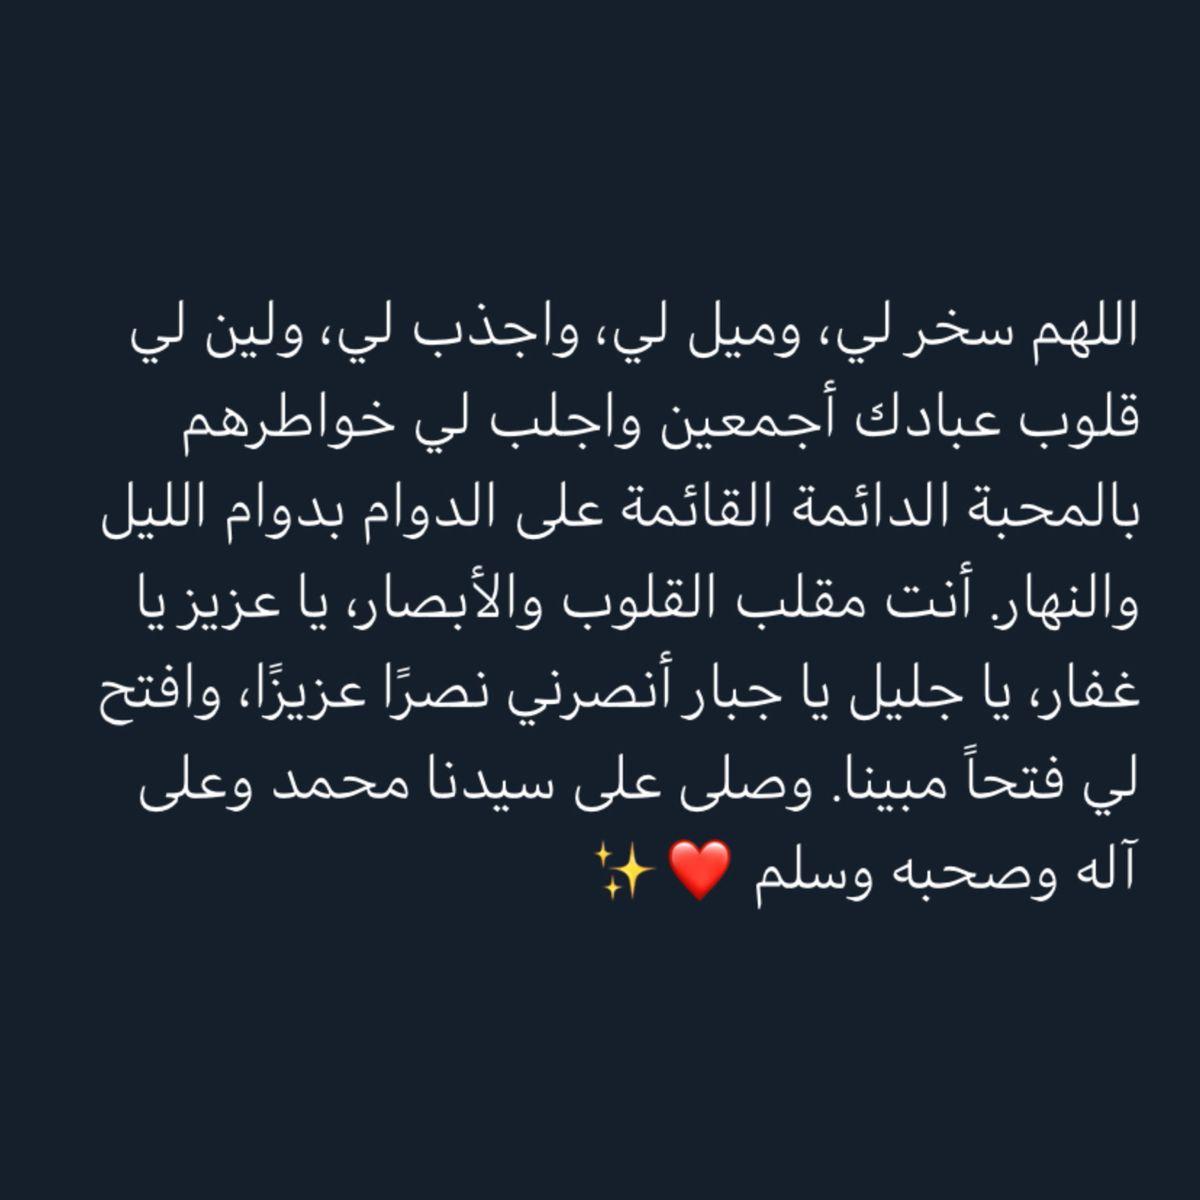 Pin By Kholoud Al Boutari On Prayersad3ya Allah Quotes Islam Quotes